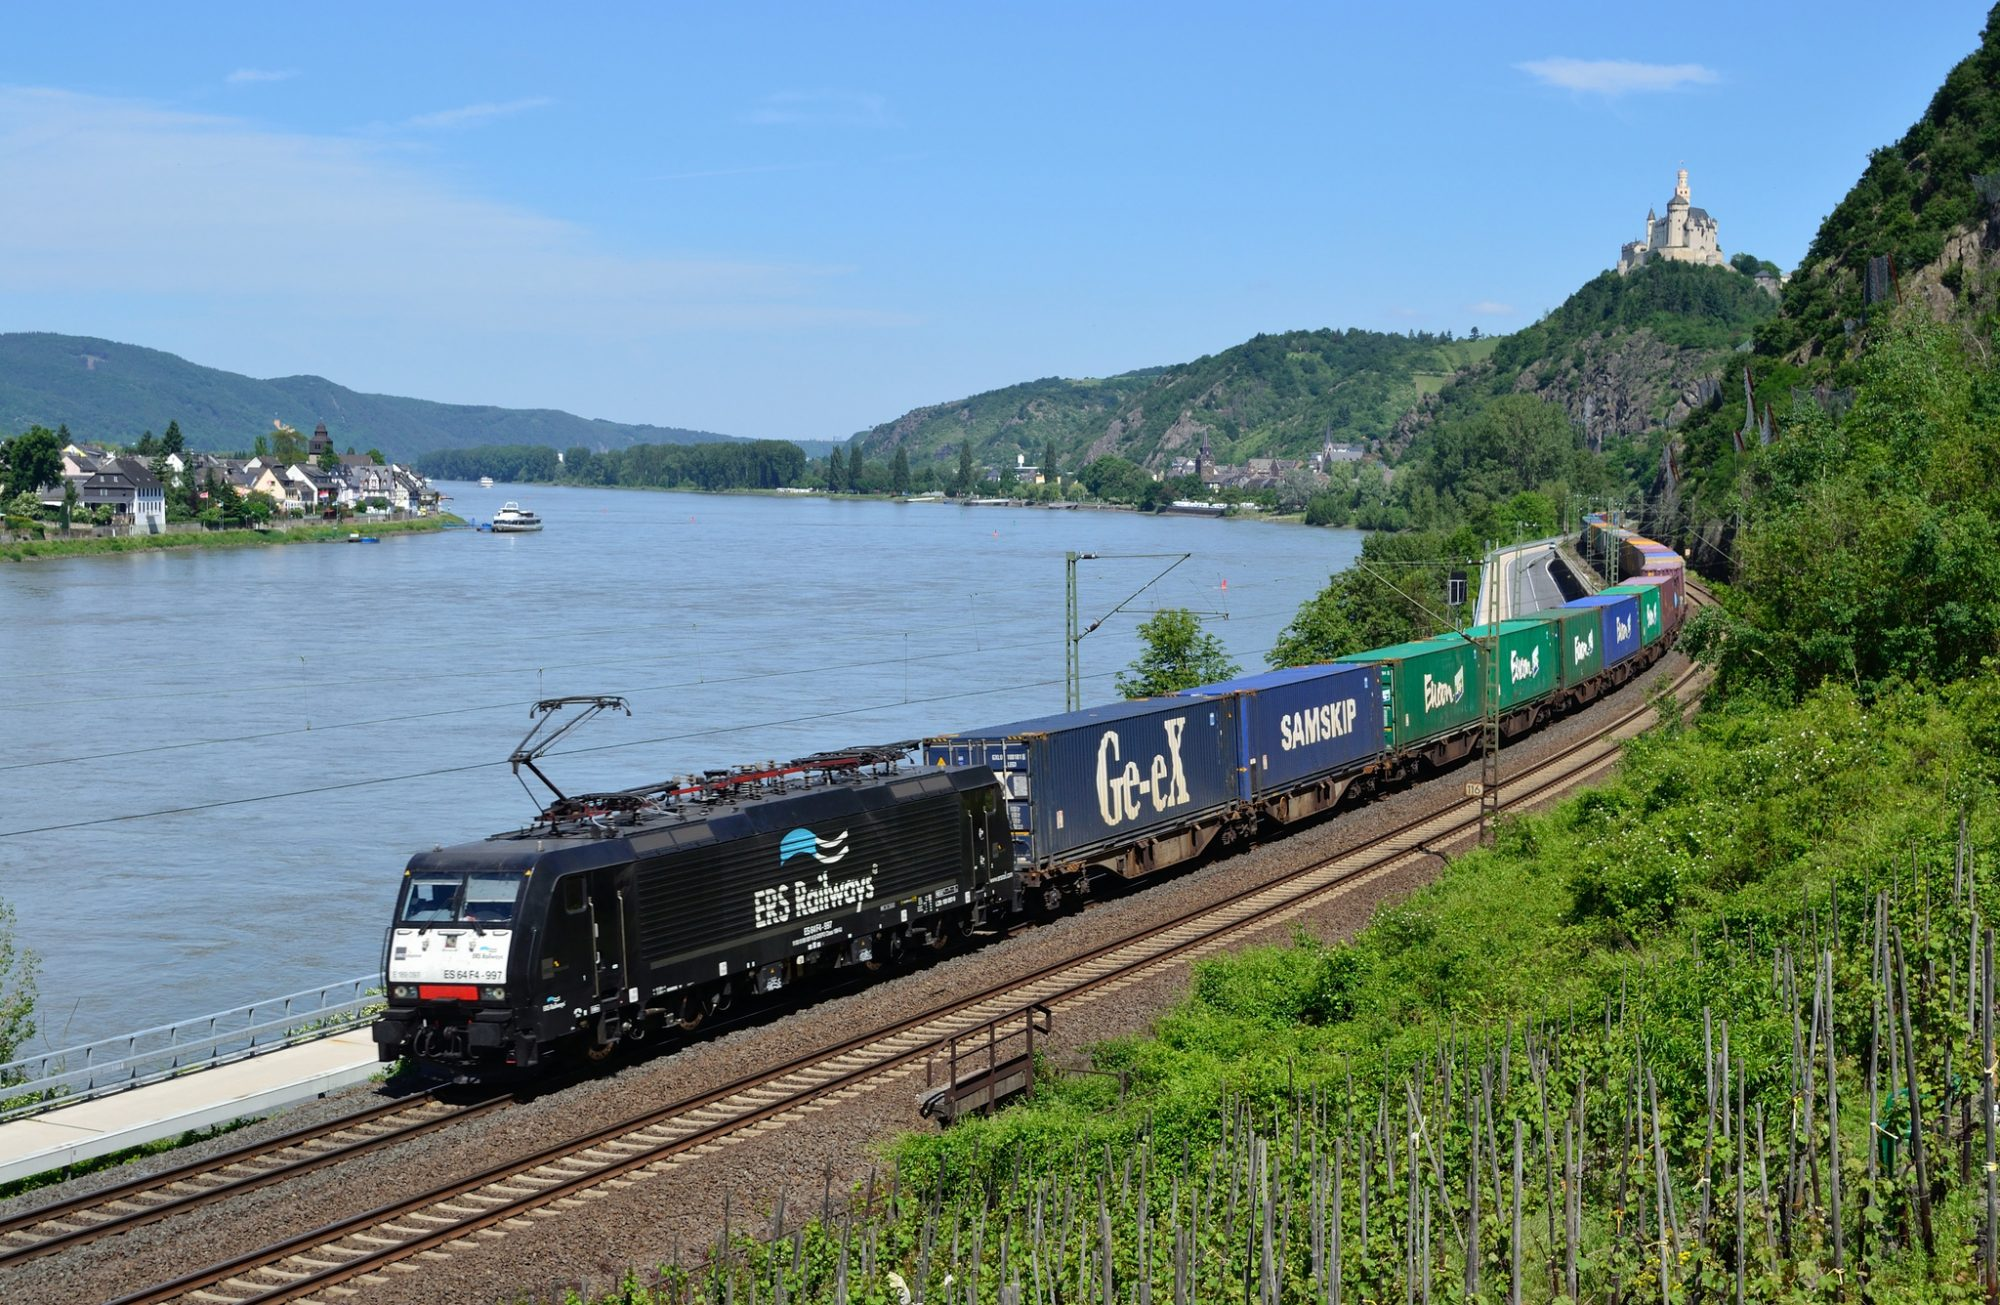 Hupac to buy ERS Railway from Genesee & Wyoming | Global Rail News